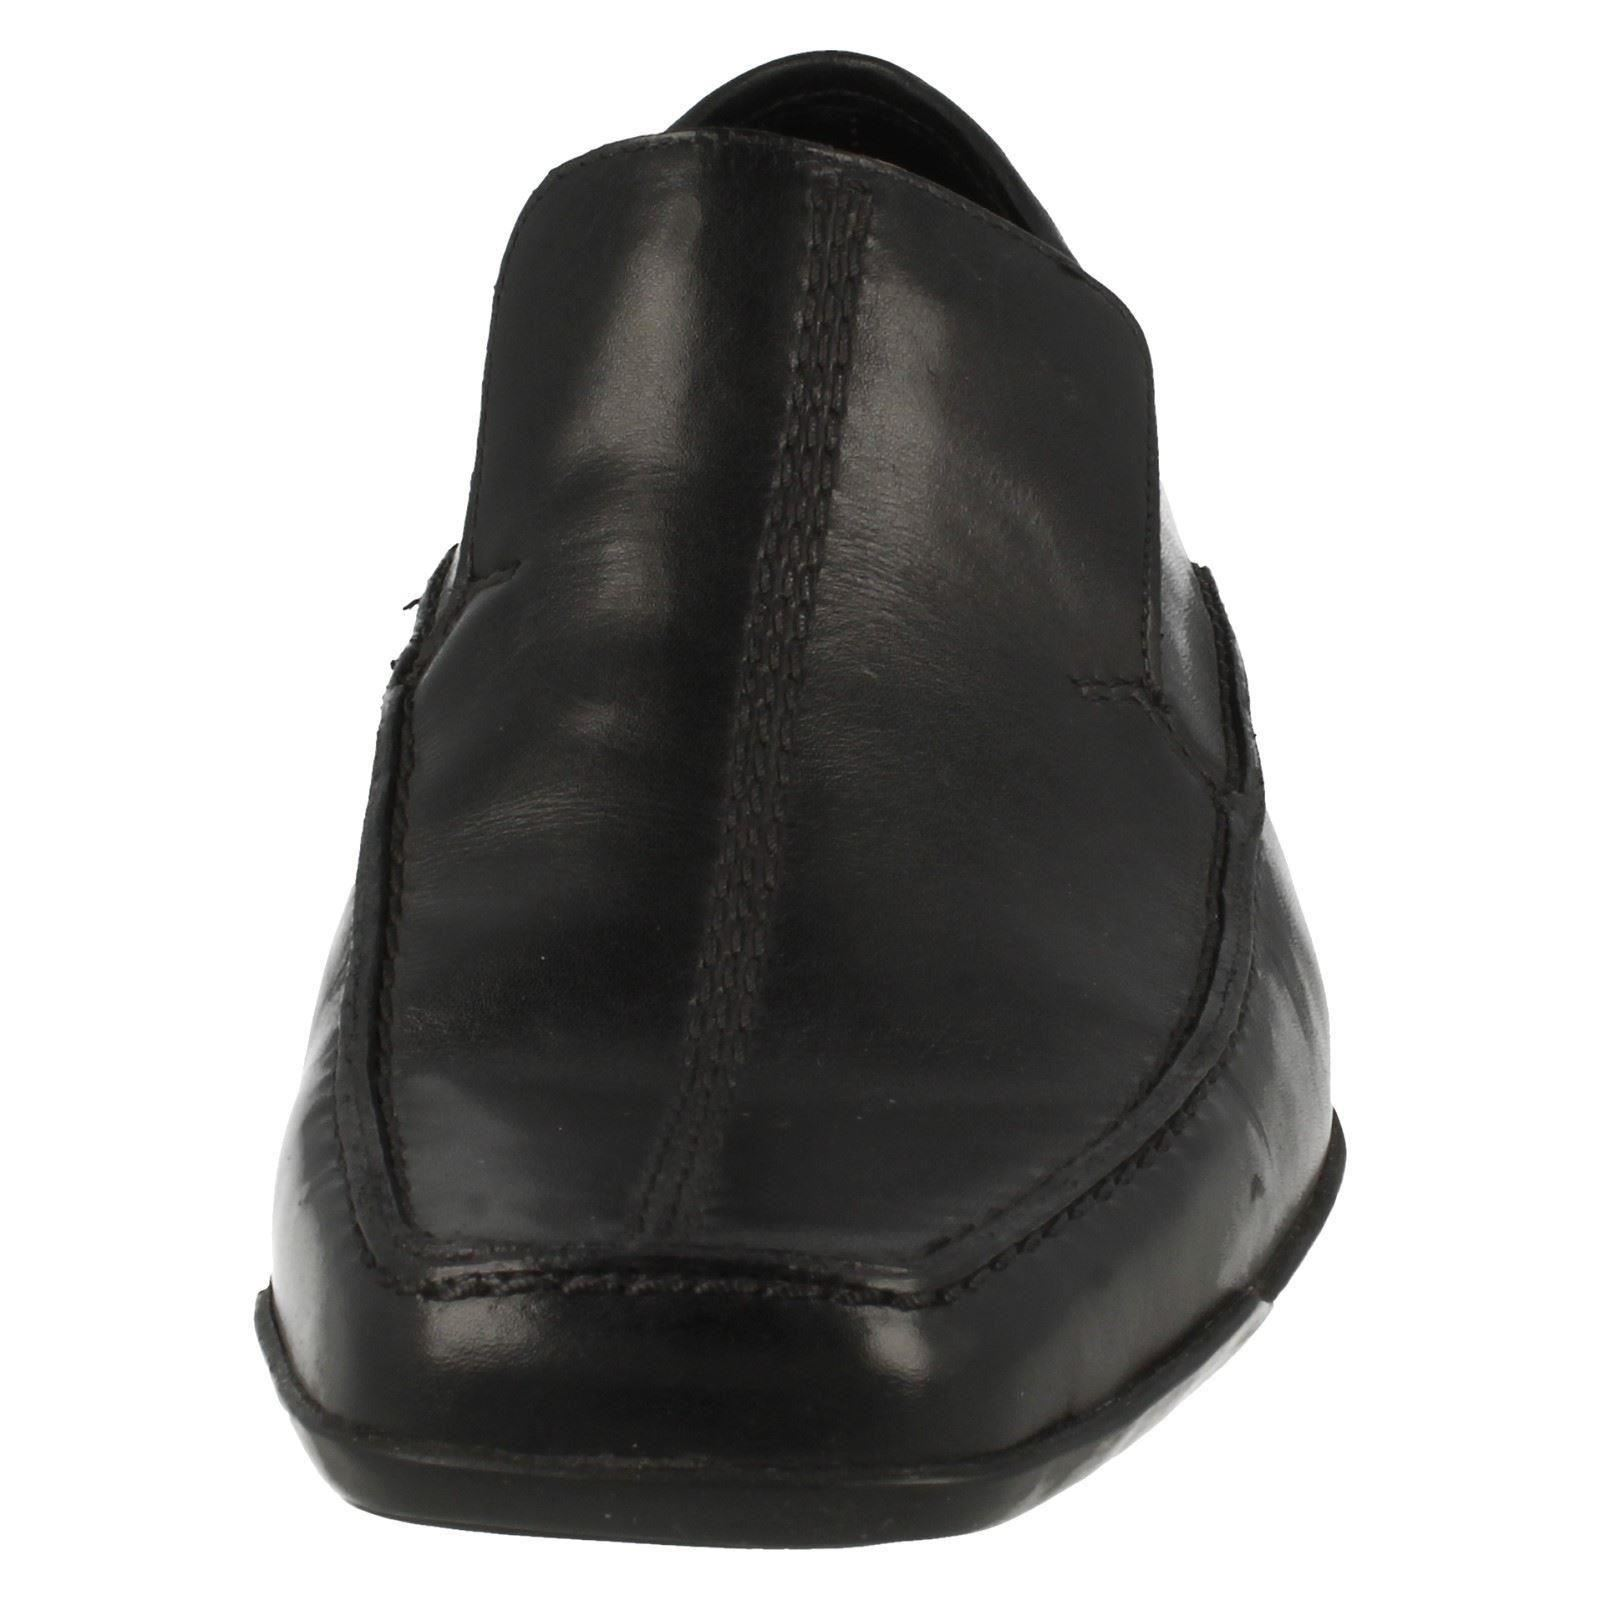 Clarks Mens Mens Clarks Formal Shoes Balistic Watch 178d3c